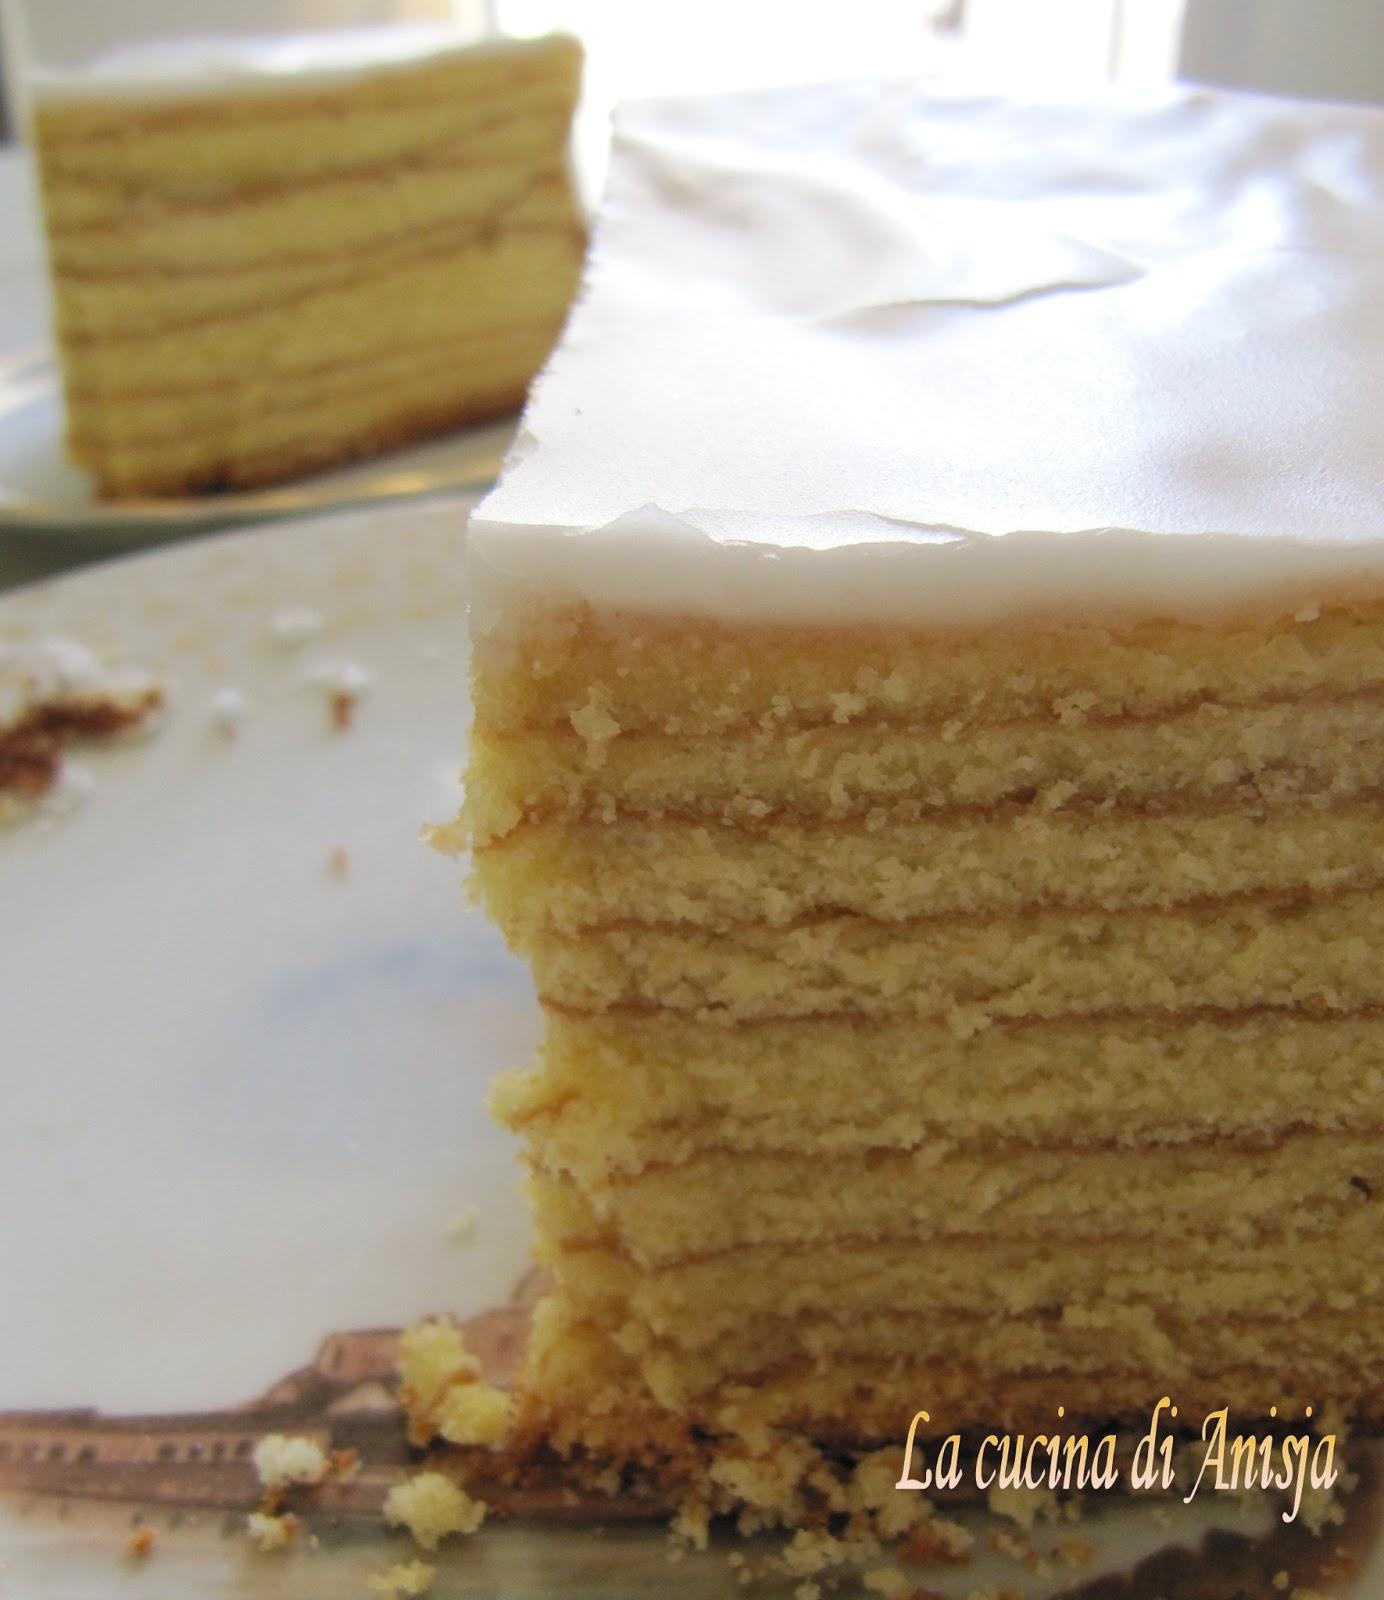 La cucina di anisja la torta baamkuch per l 39 abbecedario - La cucina tedesca ...